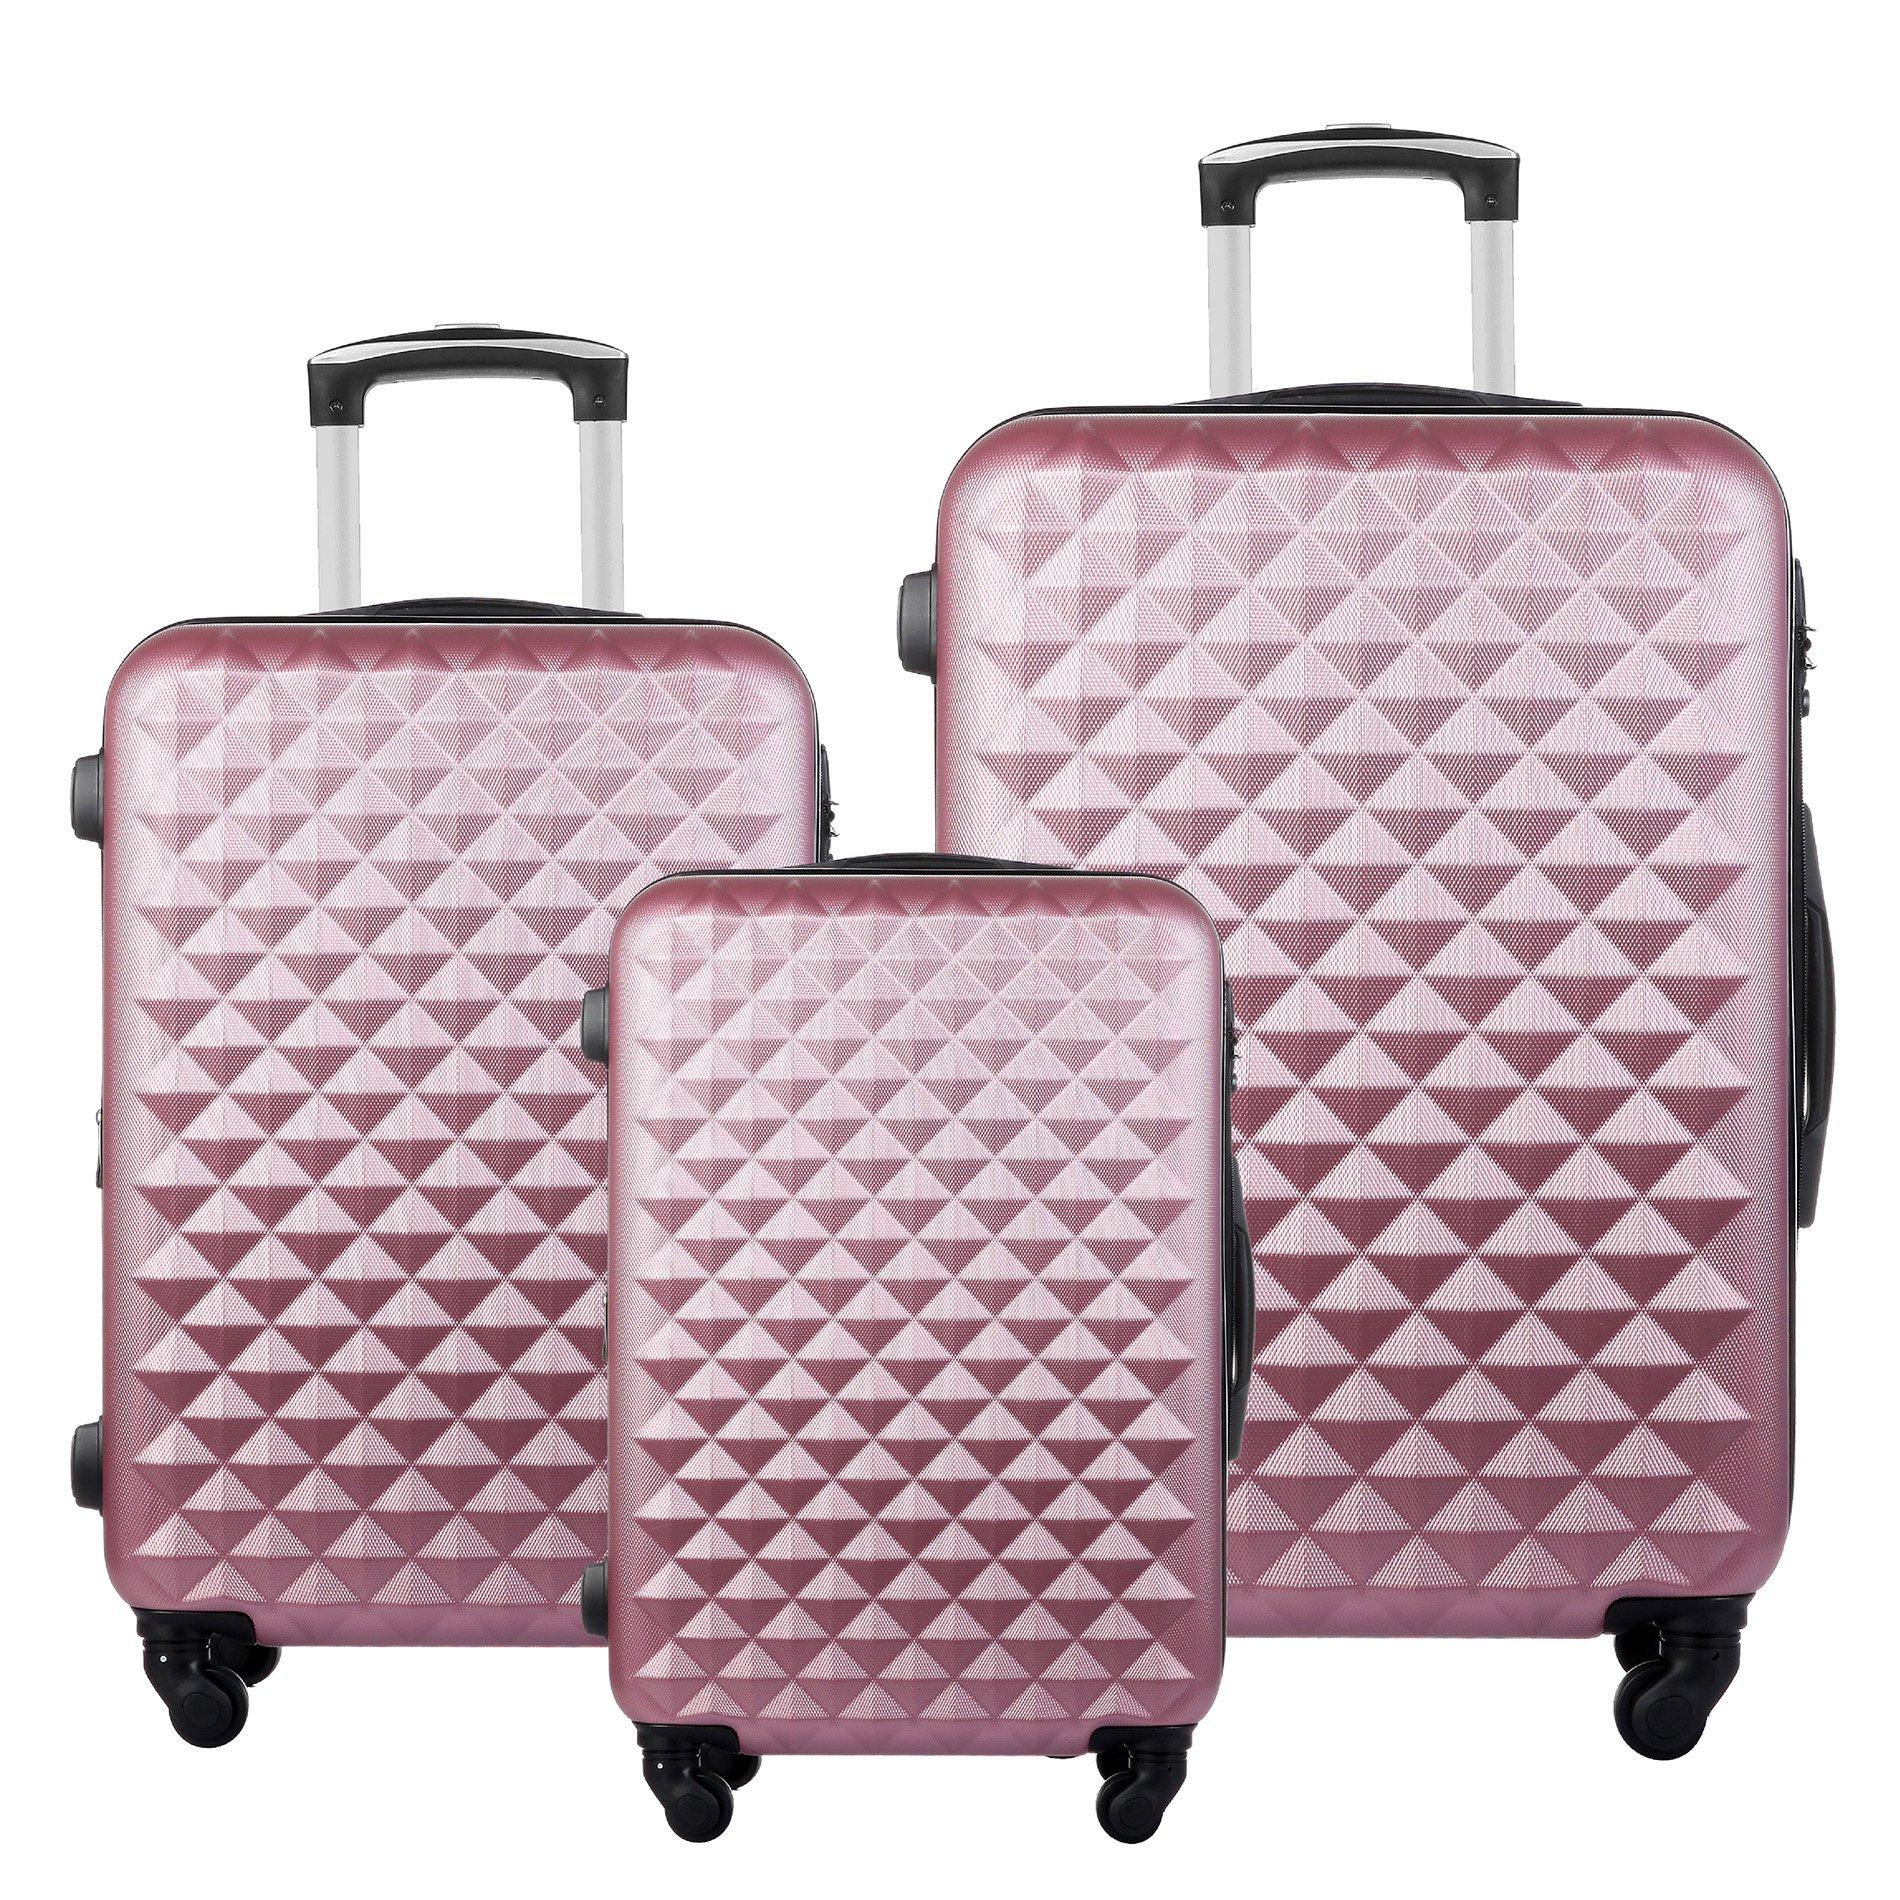 3 Piece Luggage Set Durable Lightweight Hard Case Spinner Suitecase LUG3 LY20 PINK